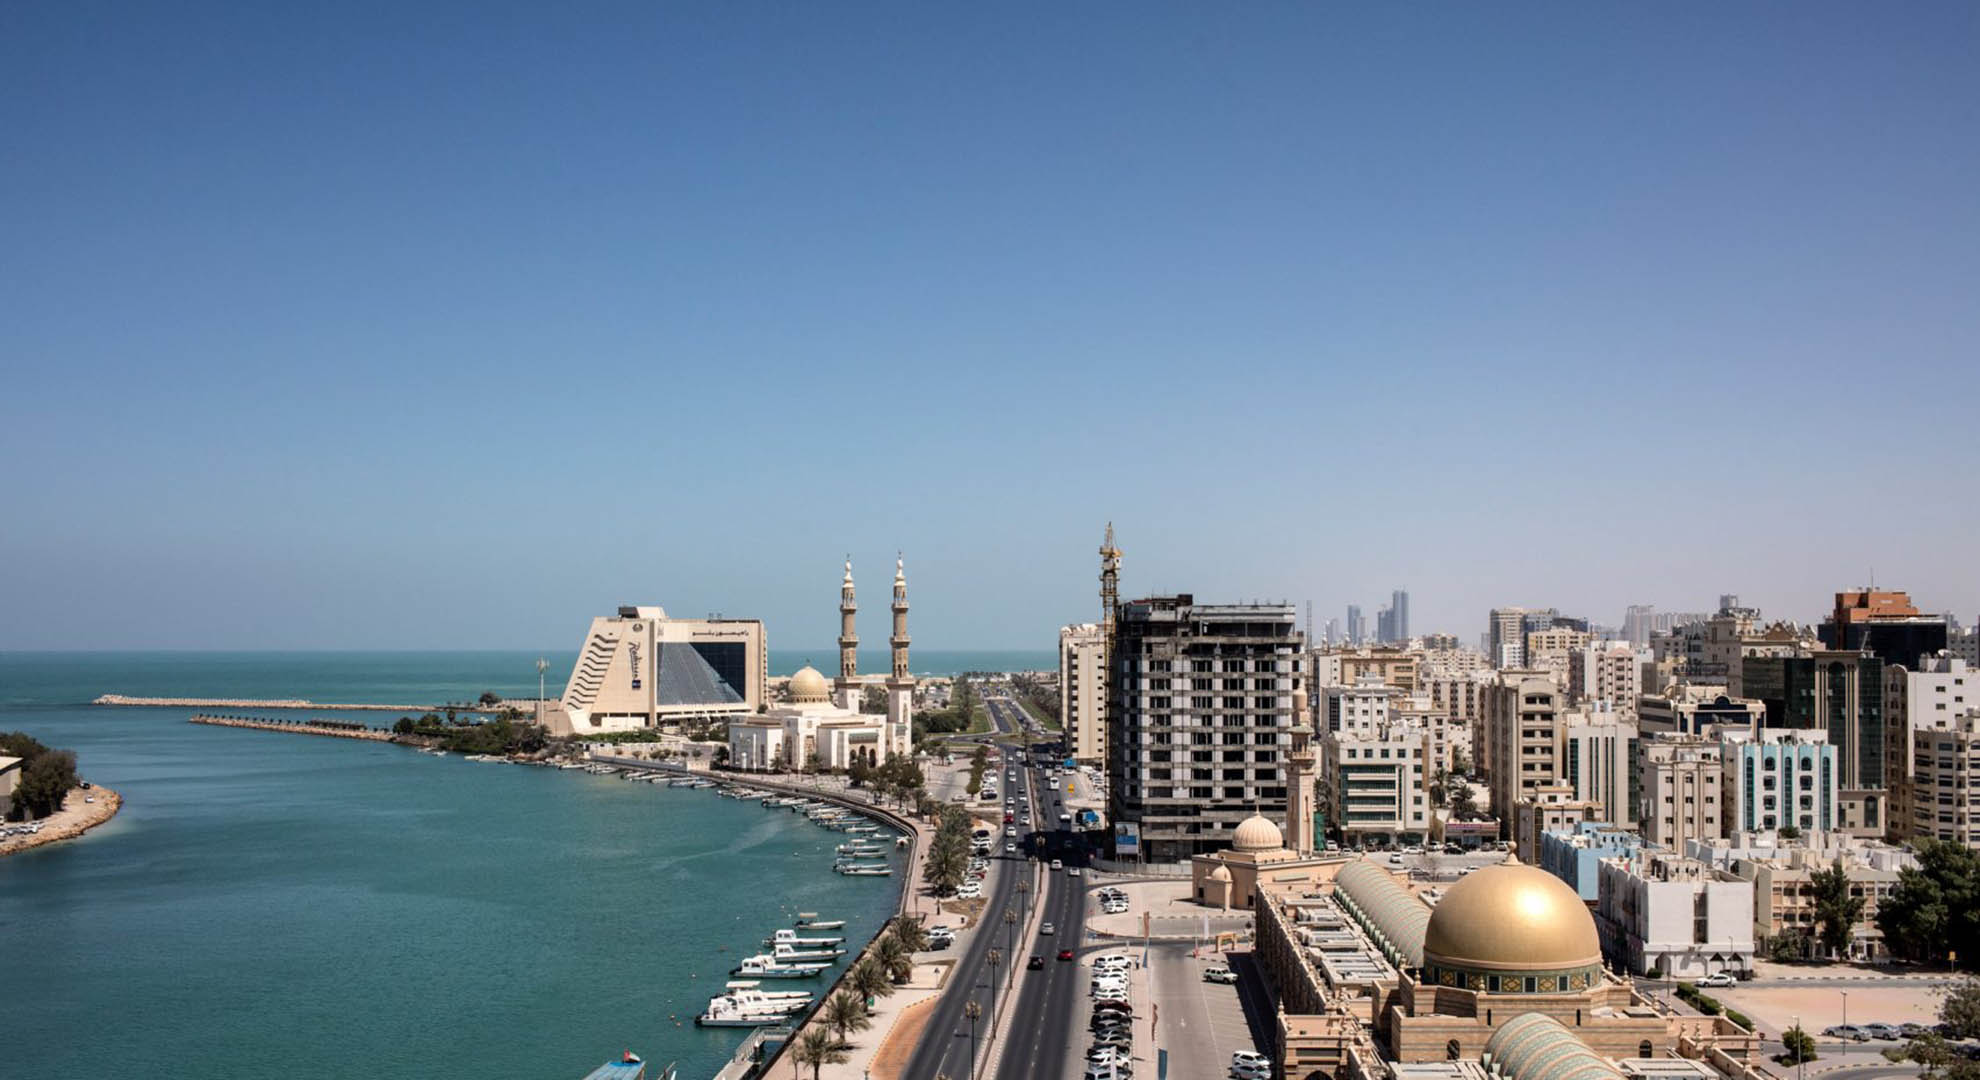 Sharjah Architecture Triennial